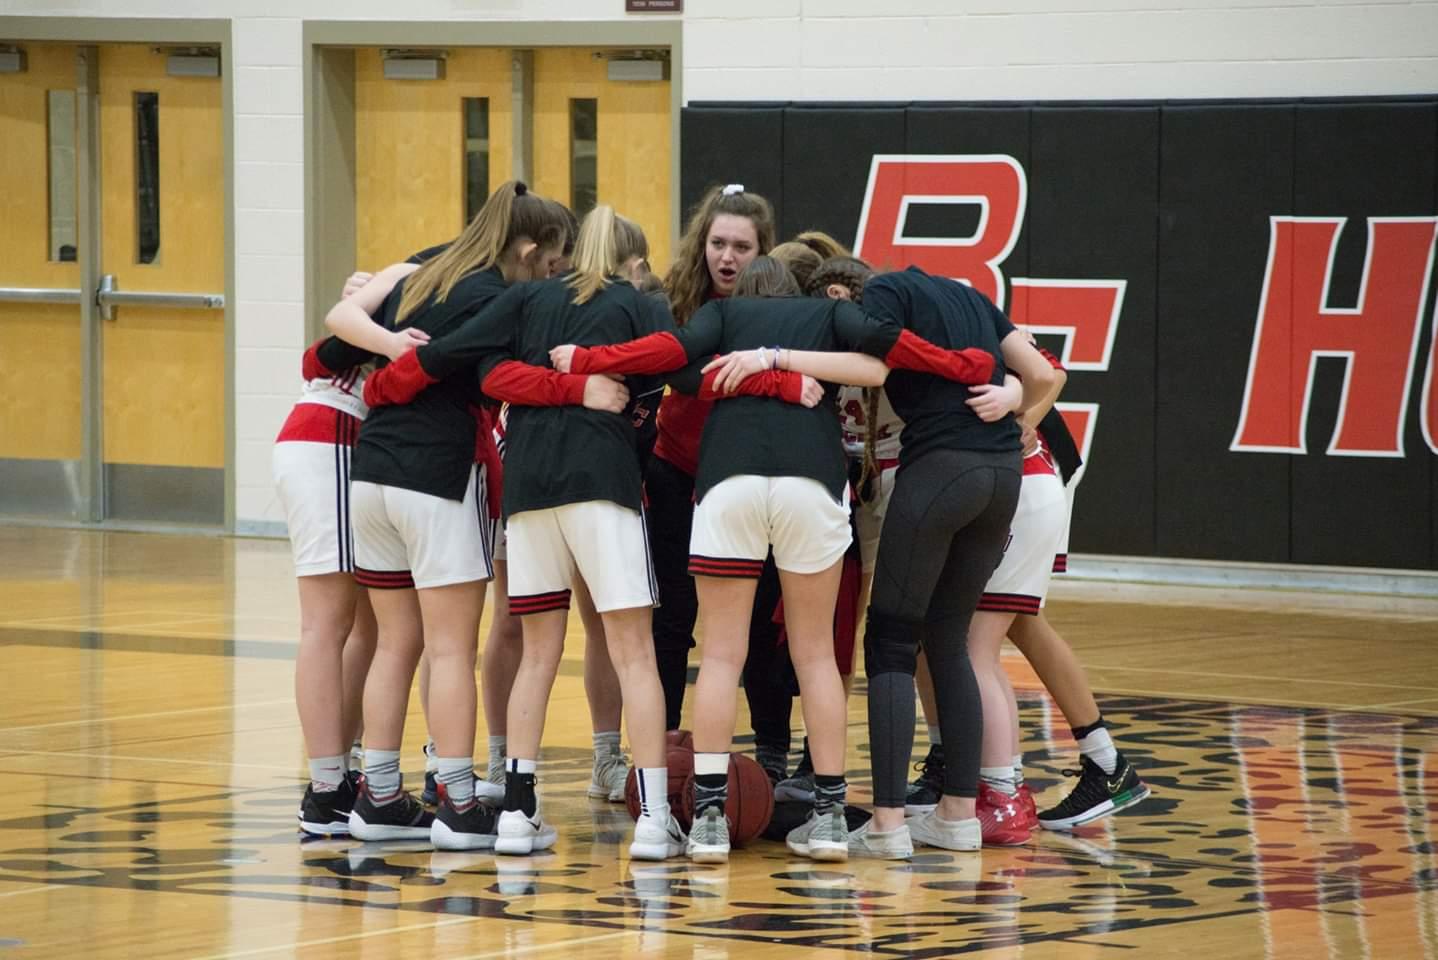 Preseason Fall Girls Basketball Camp Starts Monday, Aug 19th